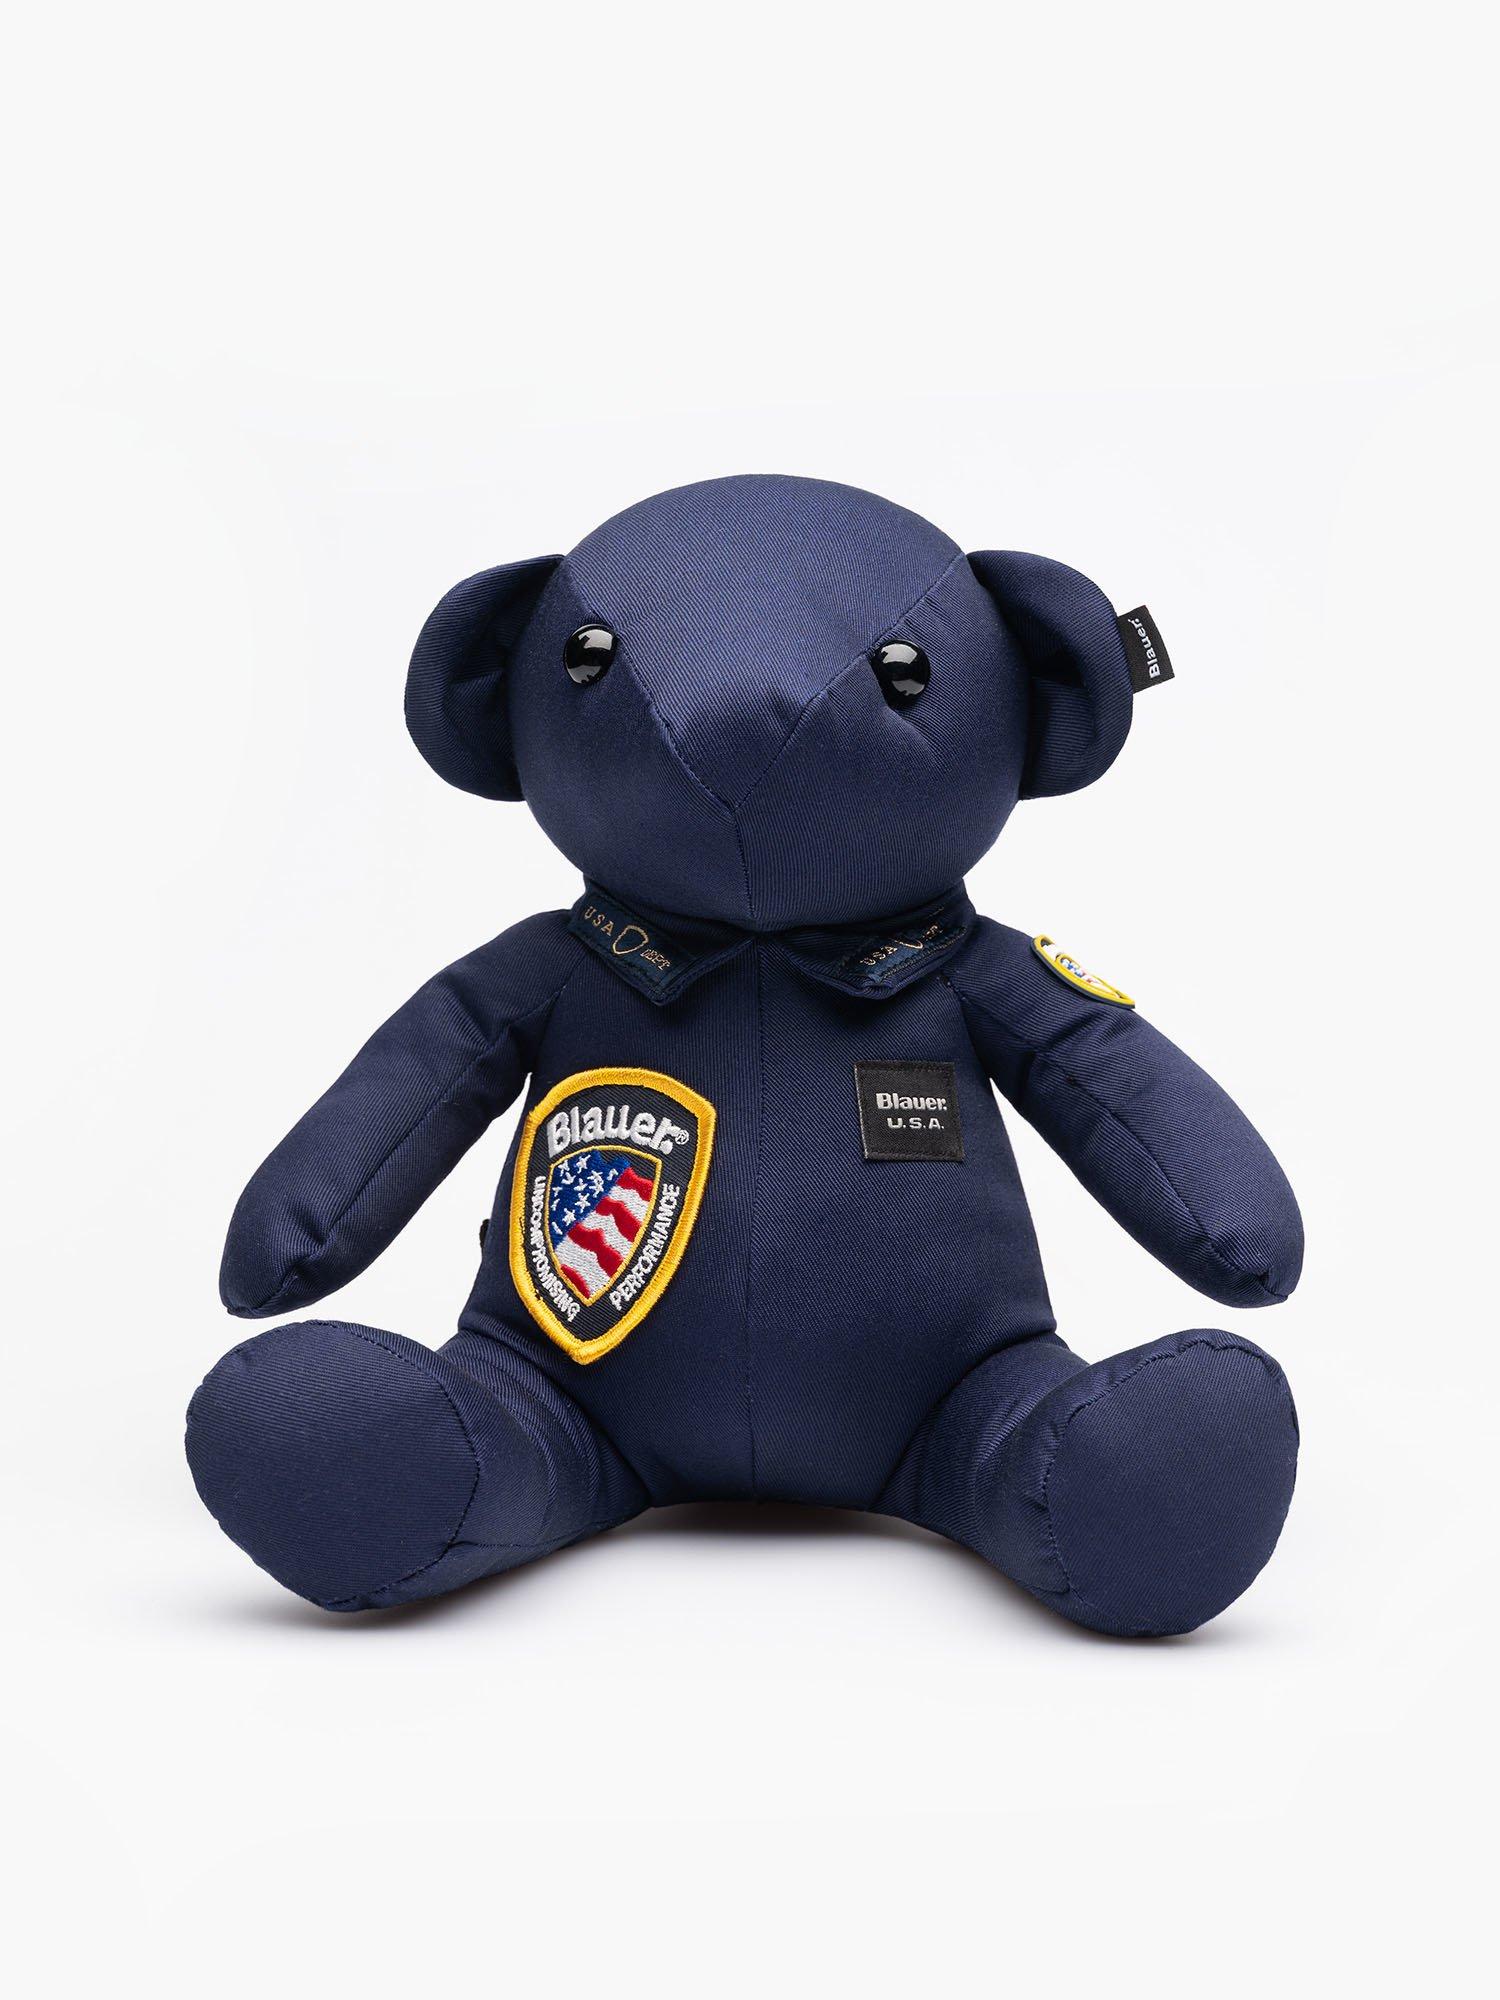 Blauer - TEDDY BLAUER POLICE BEAR MASCOT - Blue - Blauer